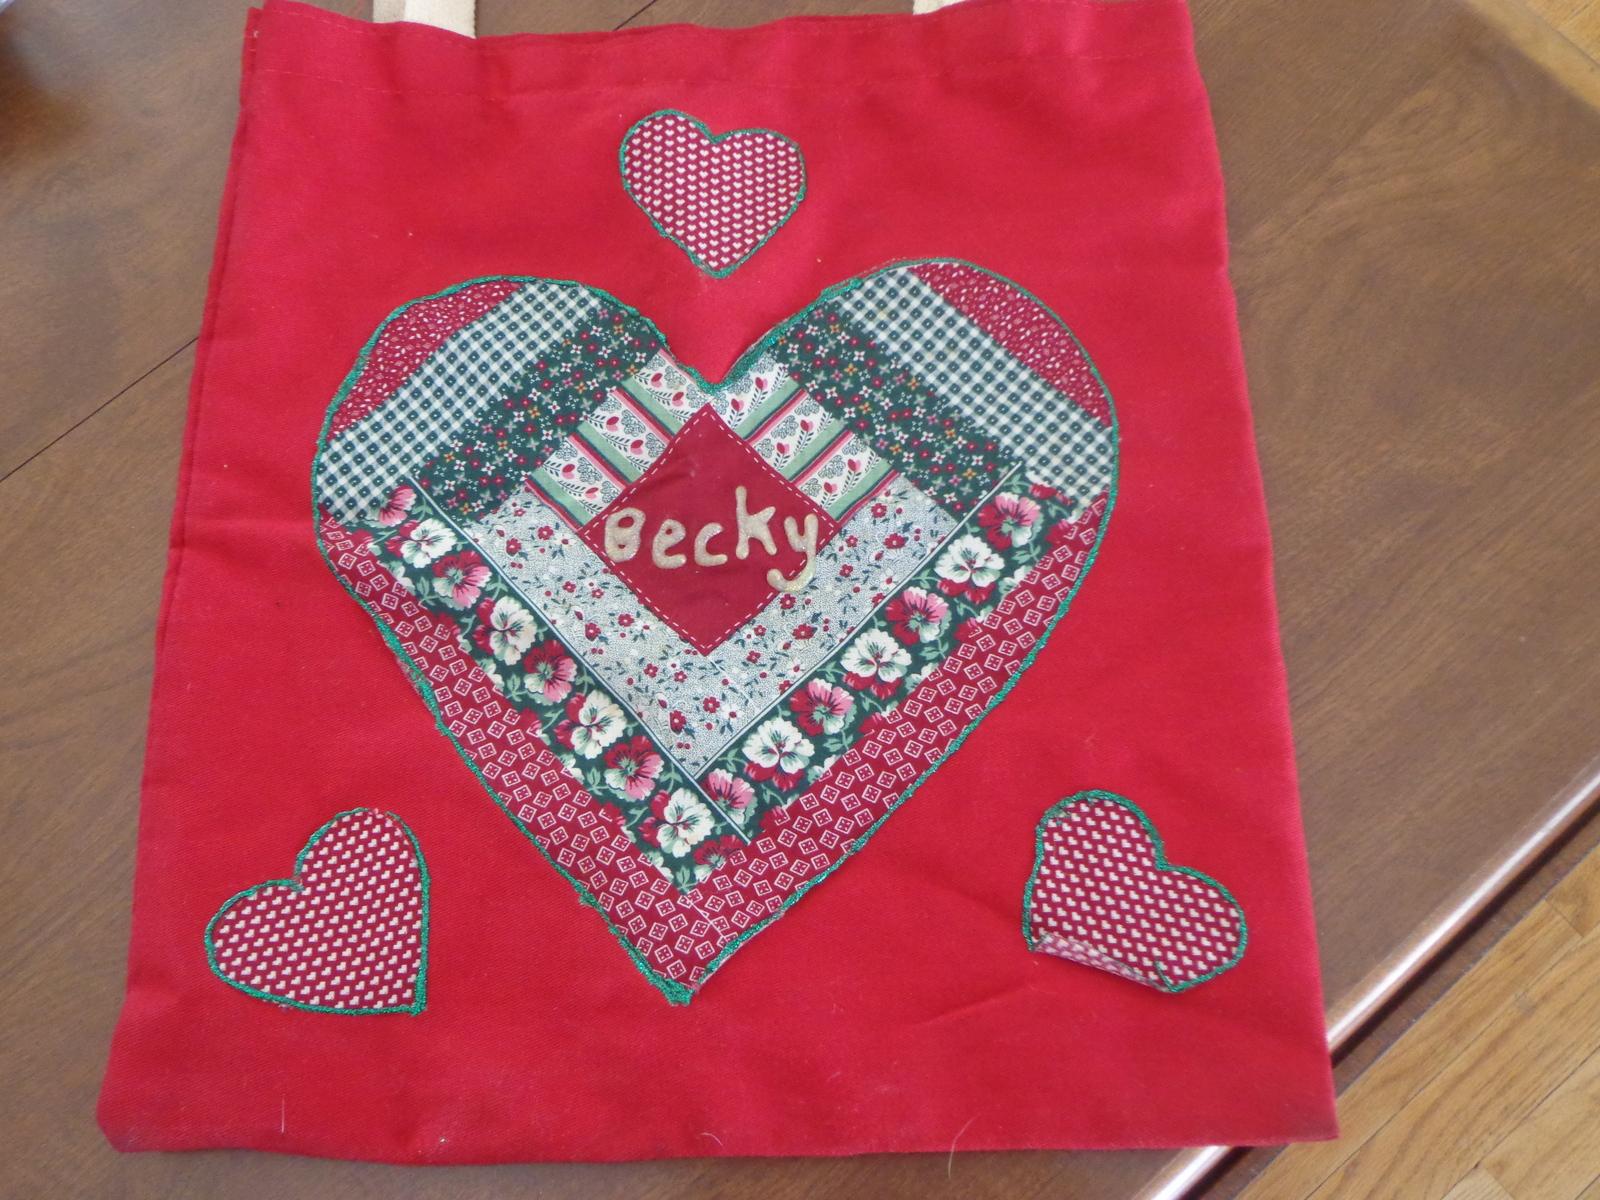 "Vintage Handmade Bookback/Tote - Personalized ""Becky"""